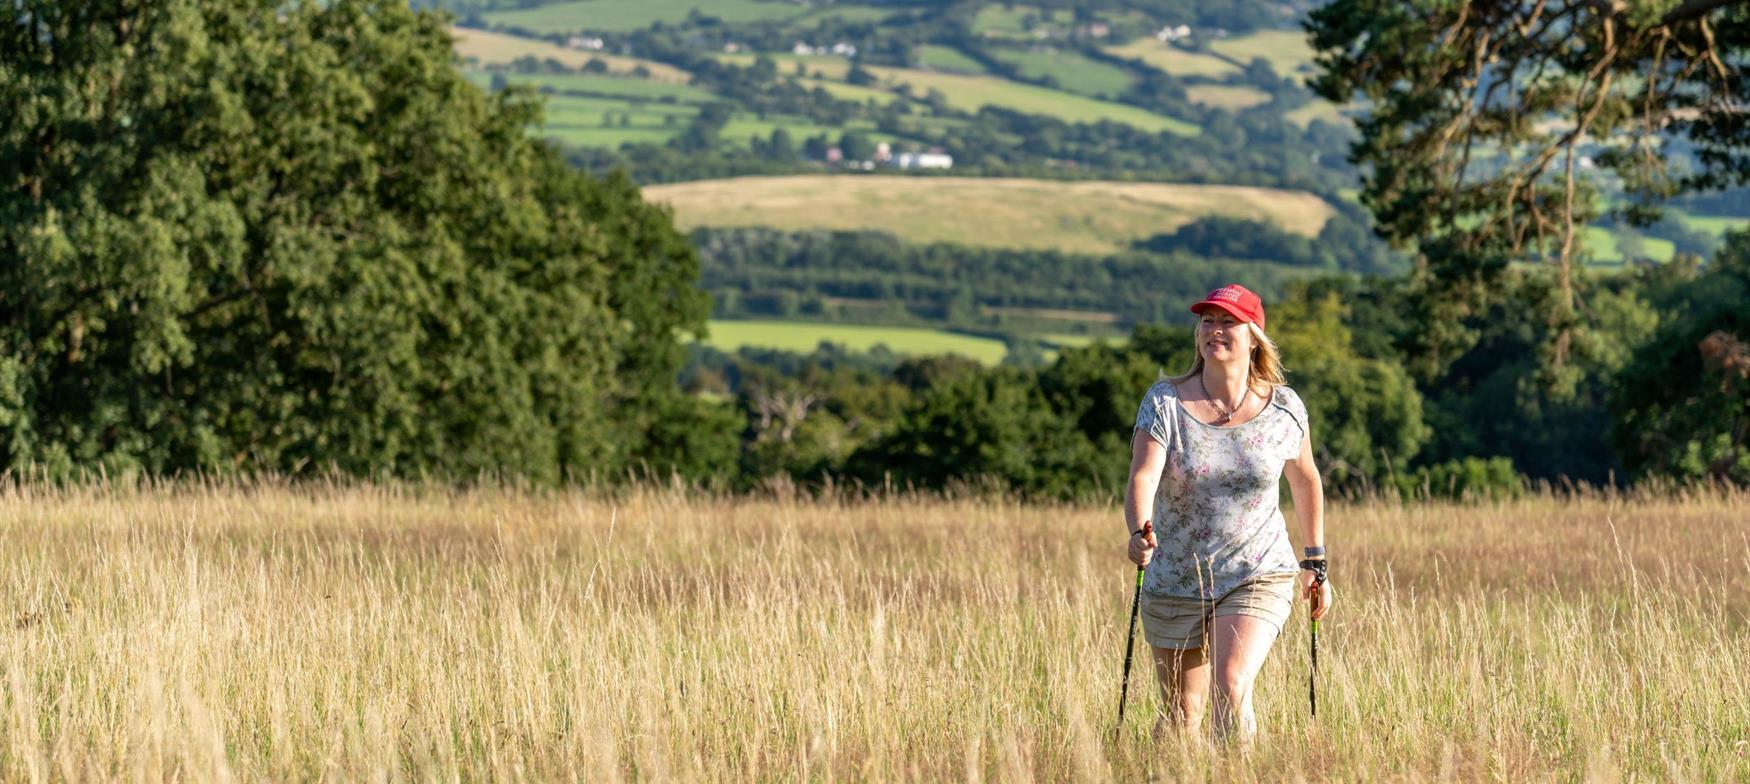 Nordic Walking on England's Great West Way